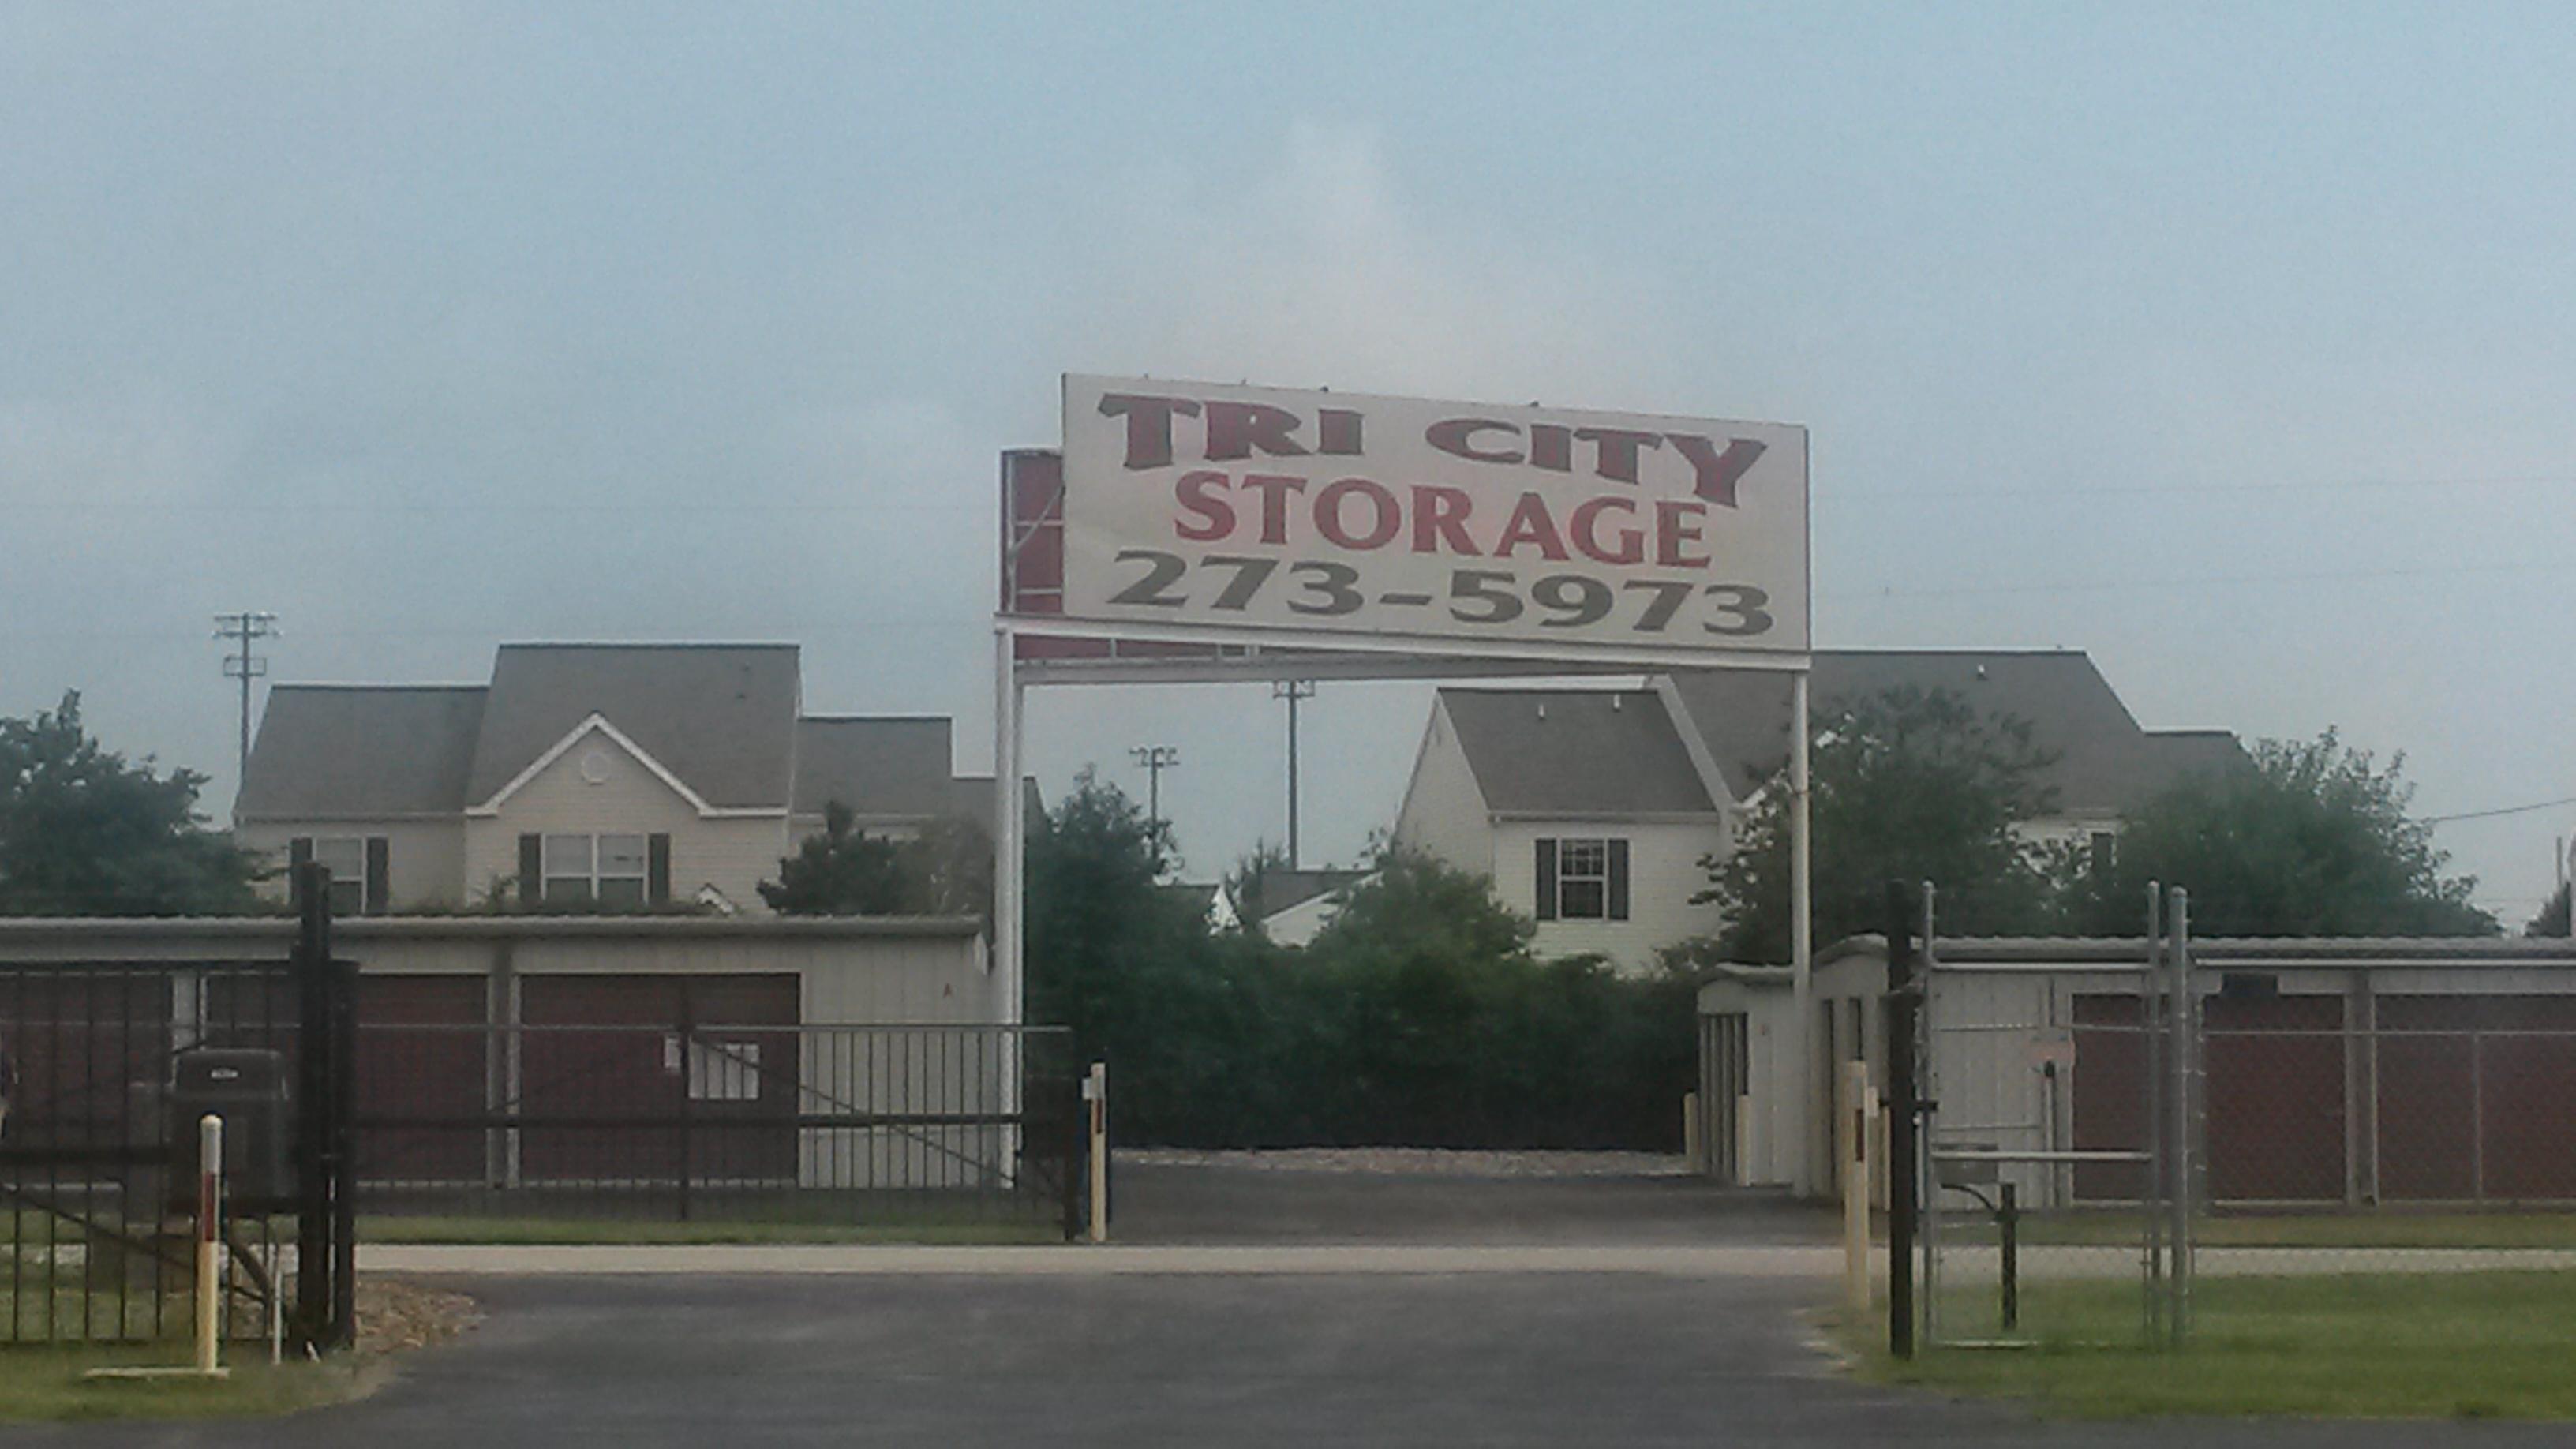 tri city self storage in bentonville ar 72712. Black Bedroom Furniture Sets. Home Design Ideas